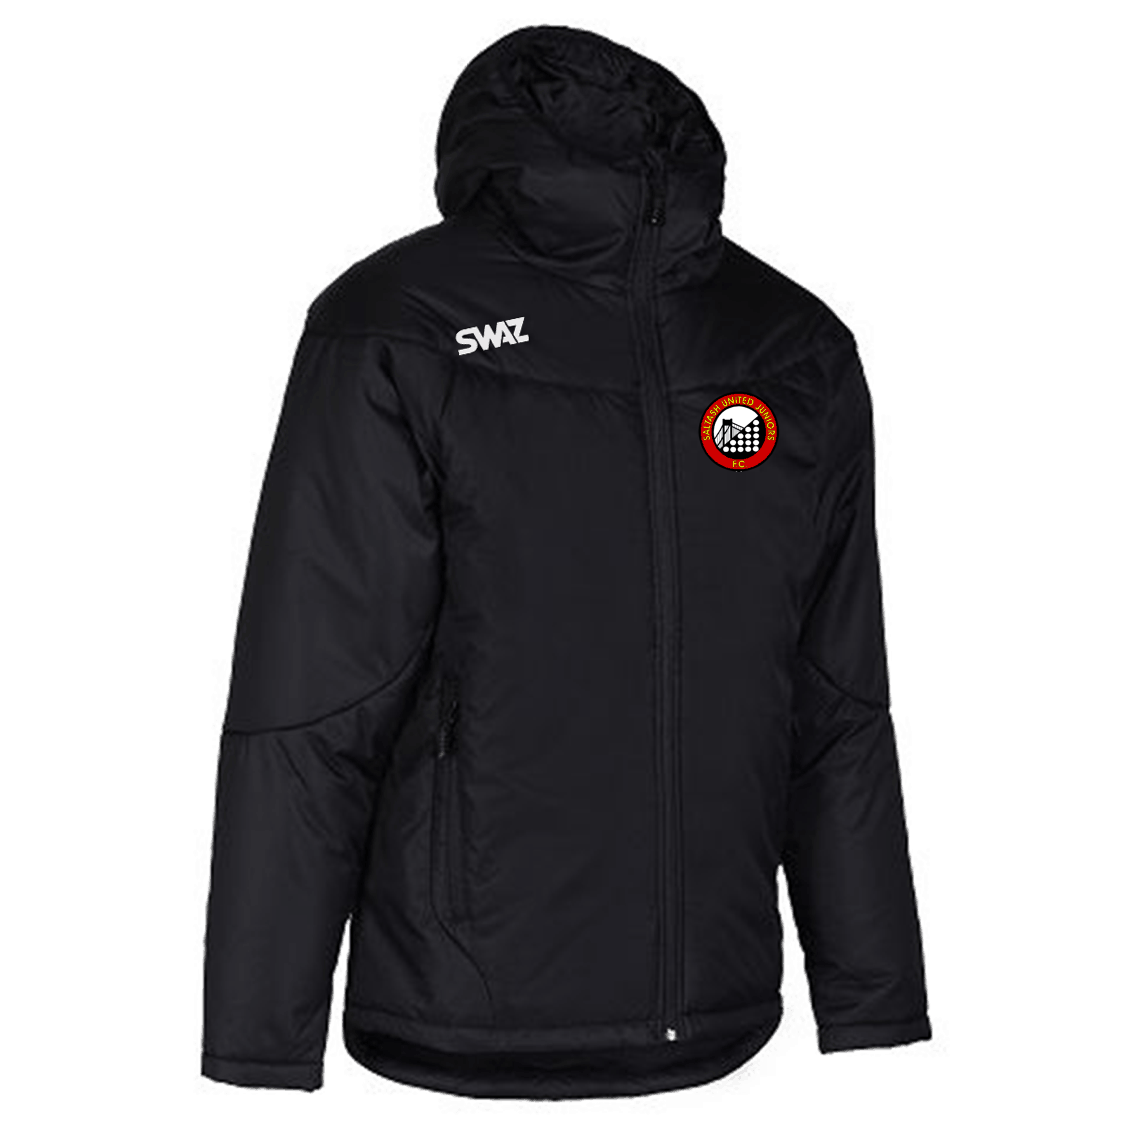 Saltash United Manager's Jacket | SWAZ | Football Kit Supplier